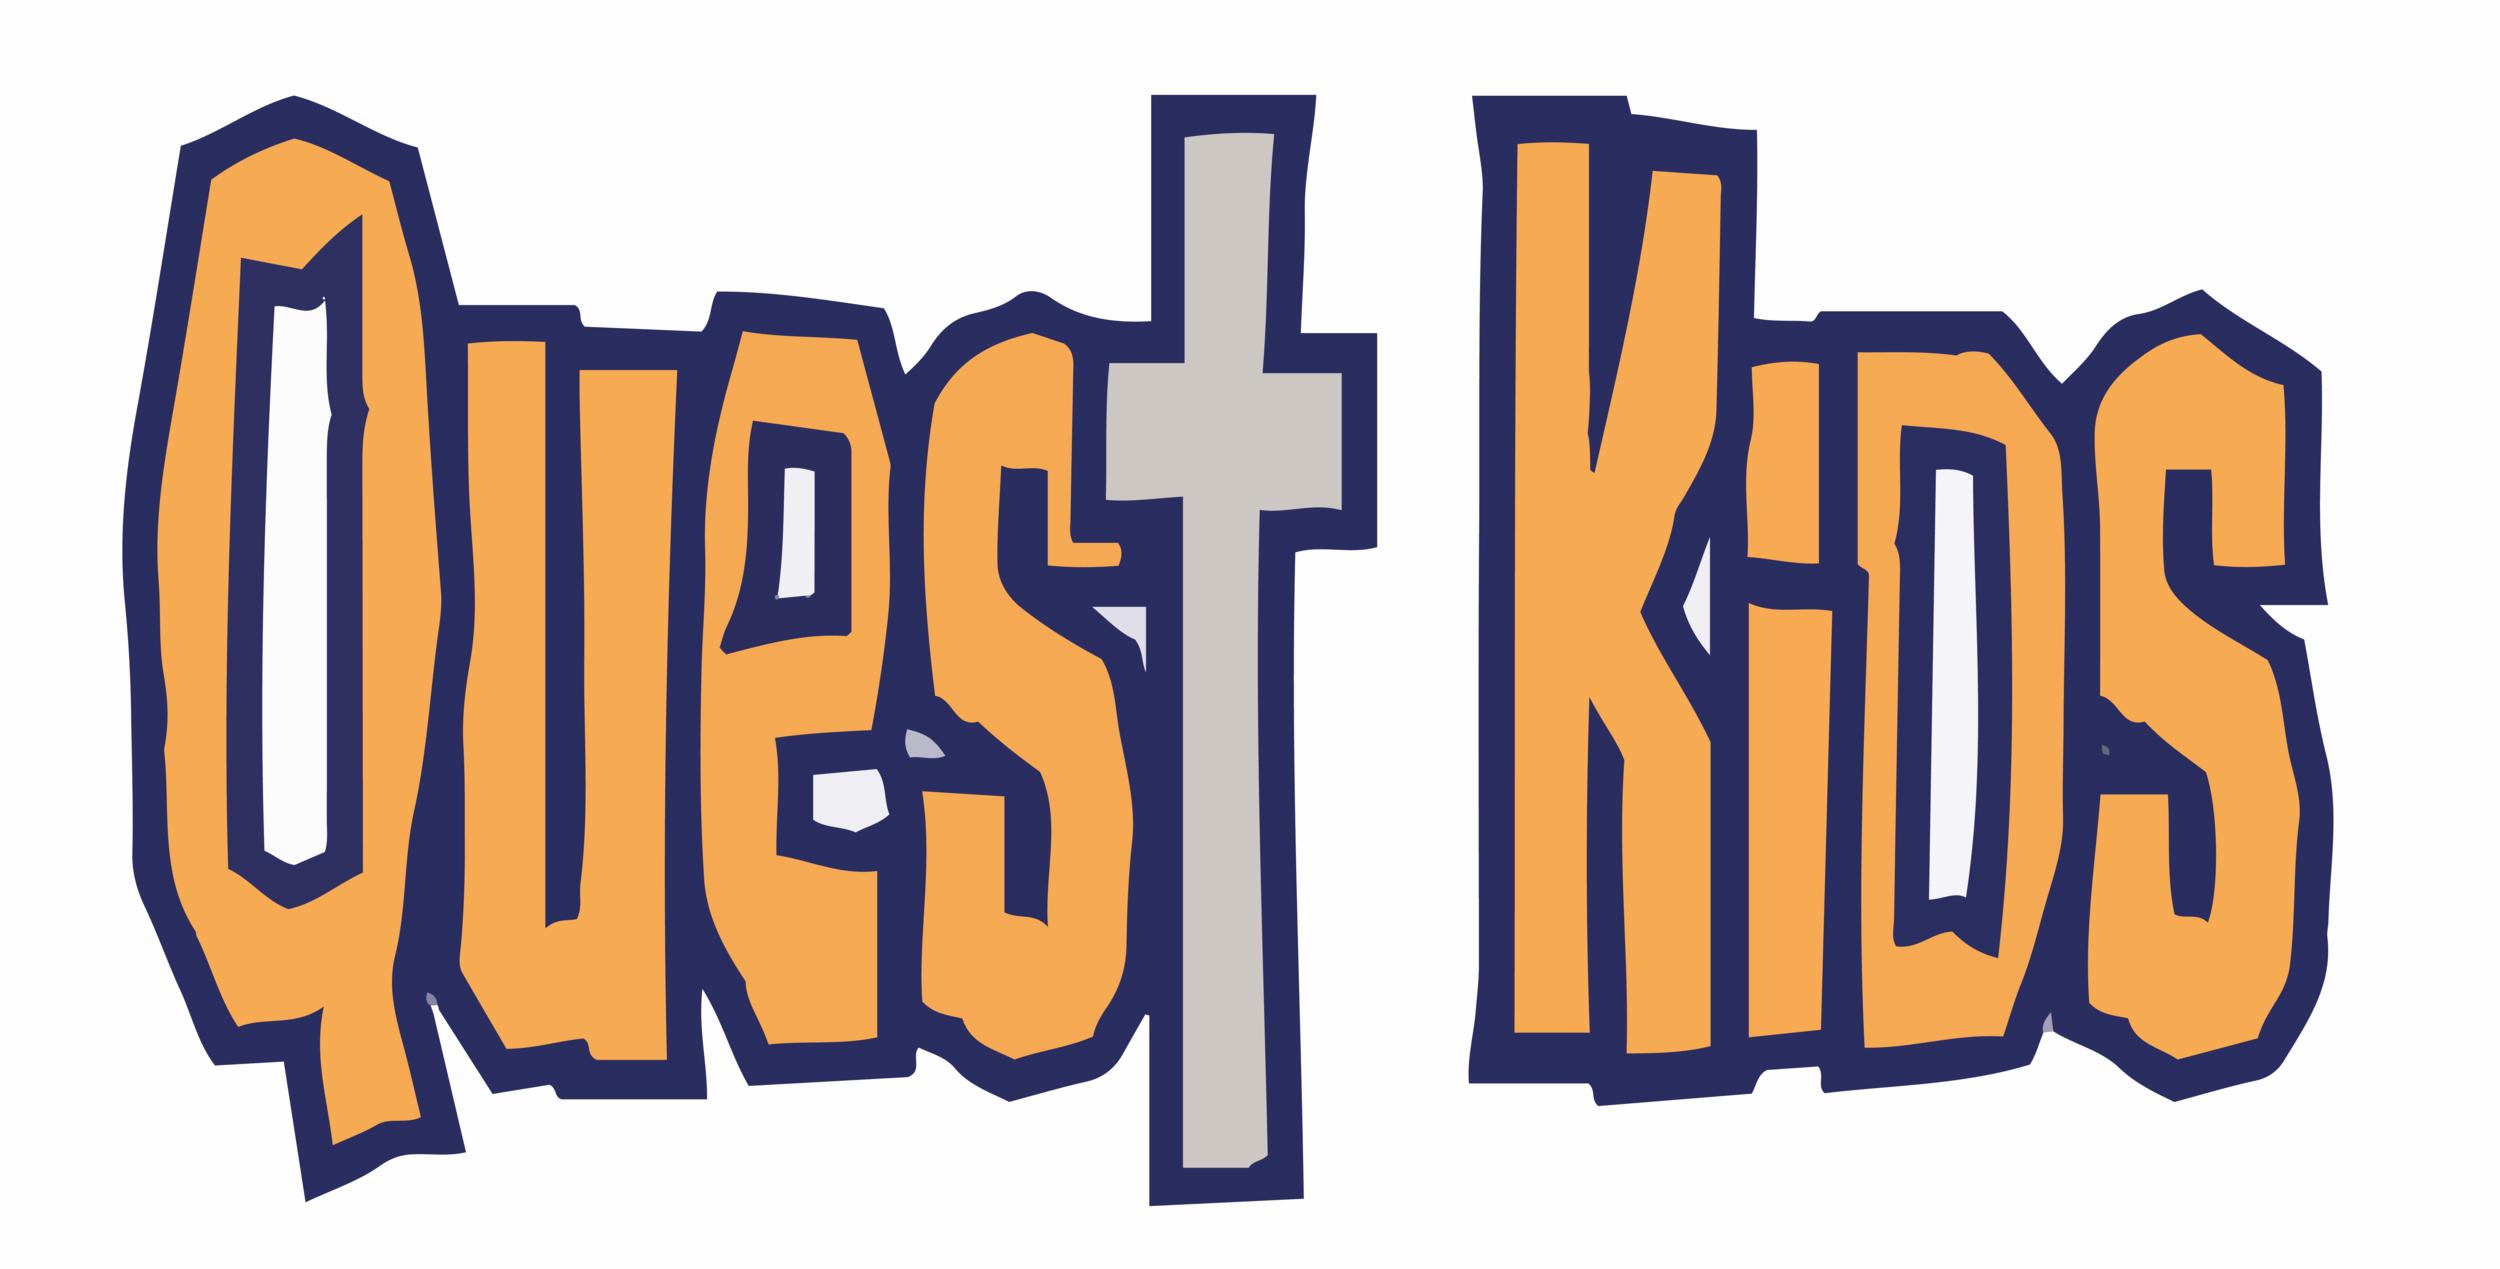 Quest Kids.png